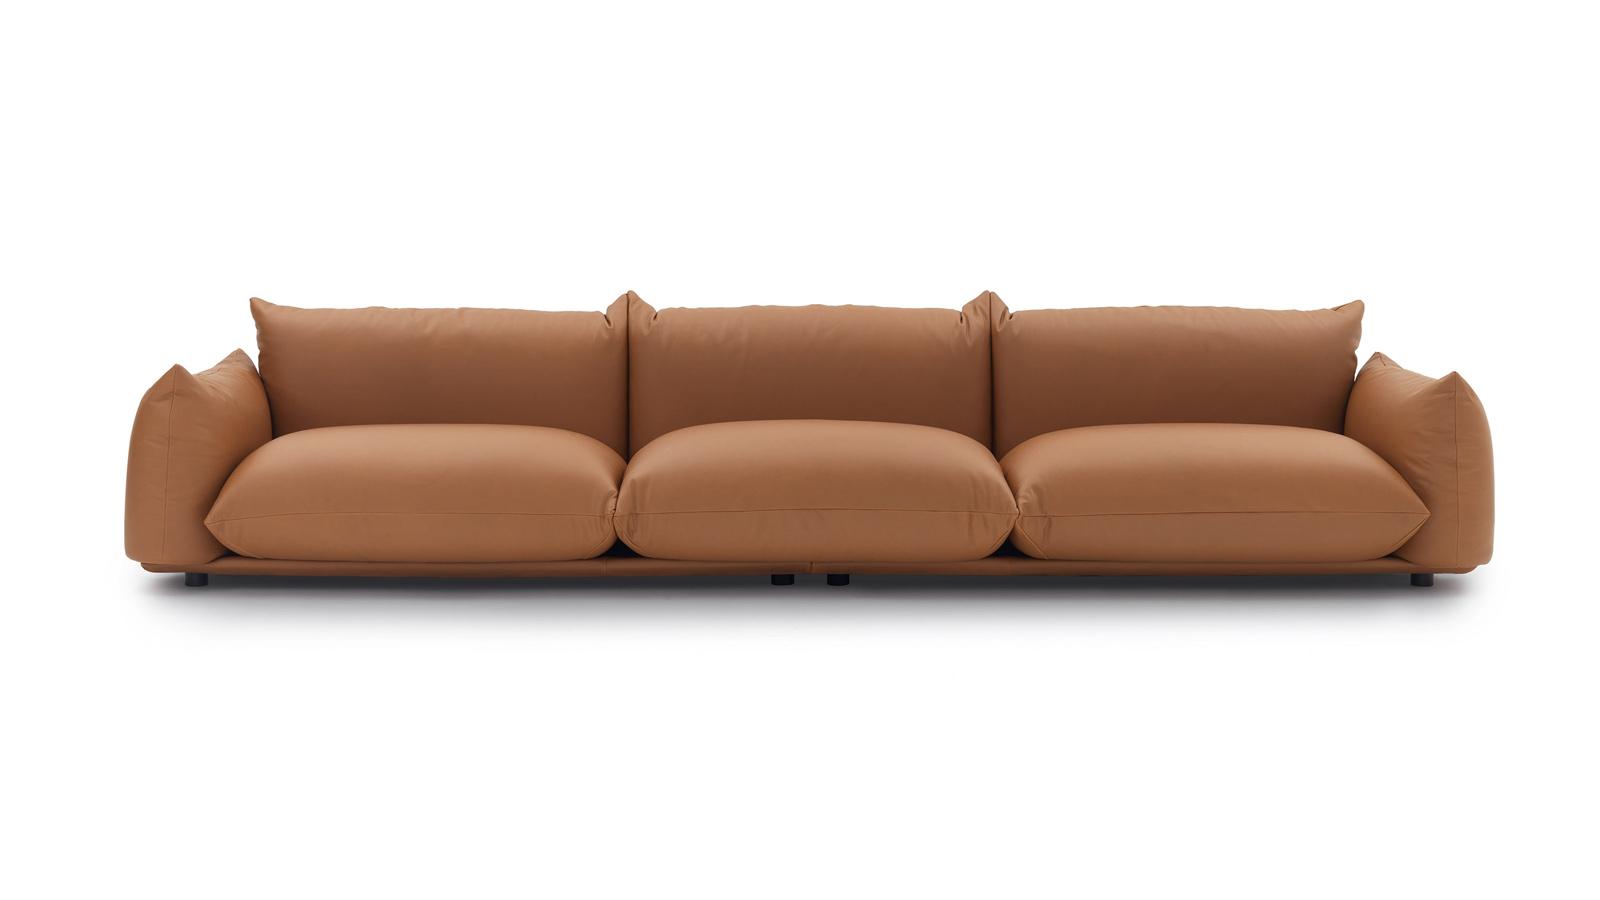 TinnappelMetz-arflex-marenco-sofa-07